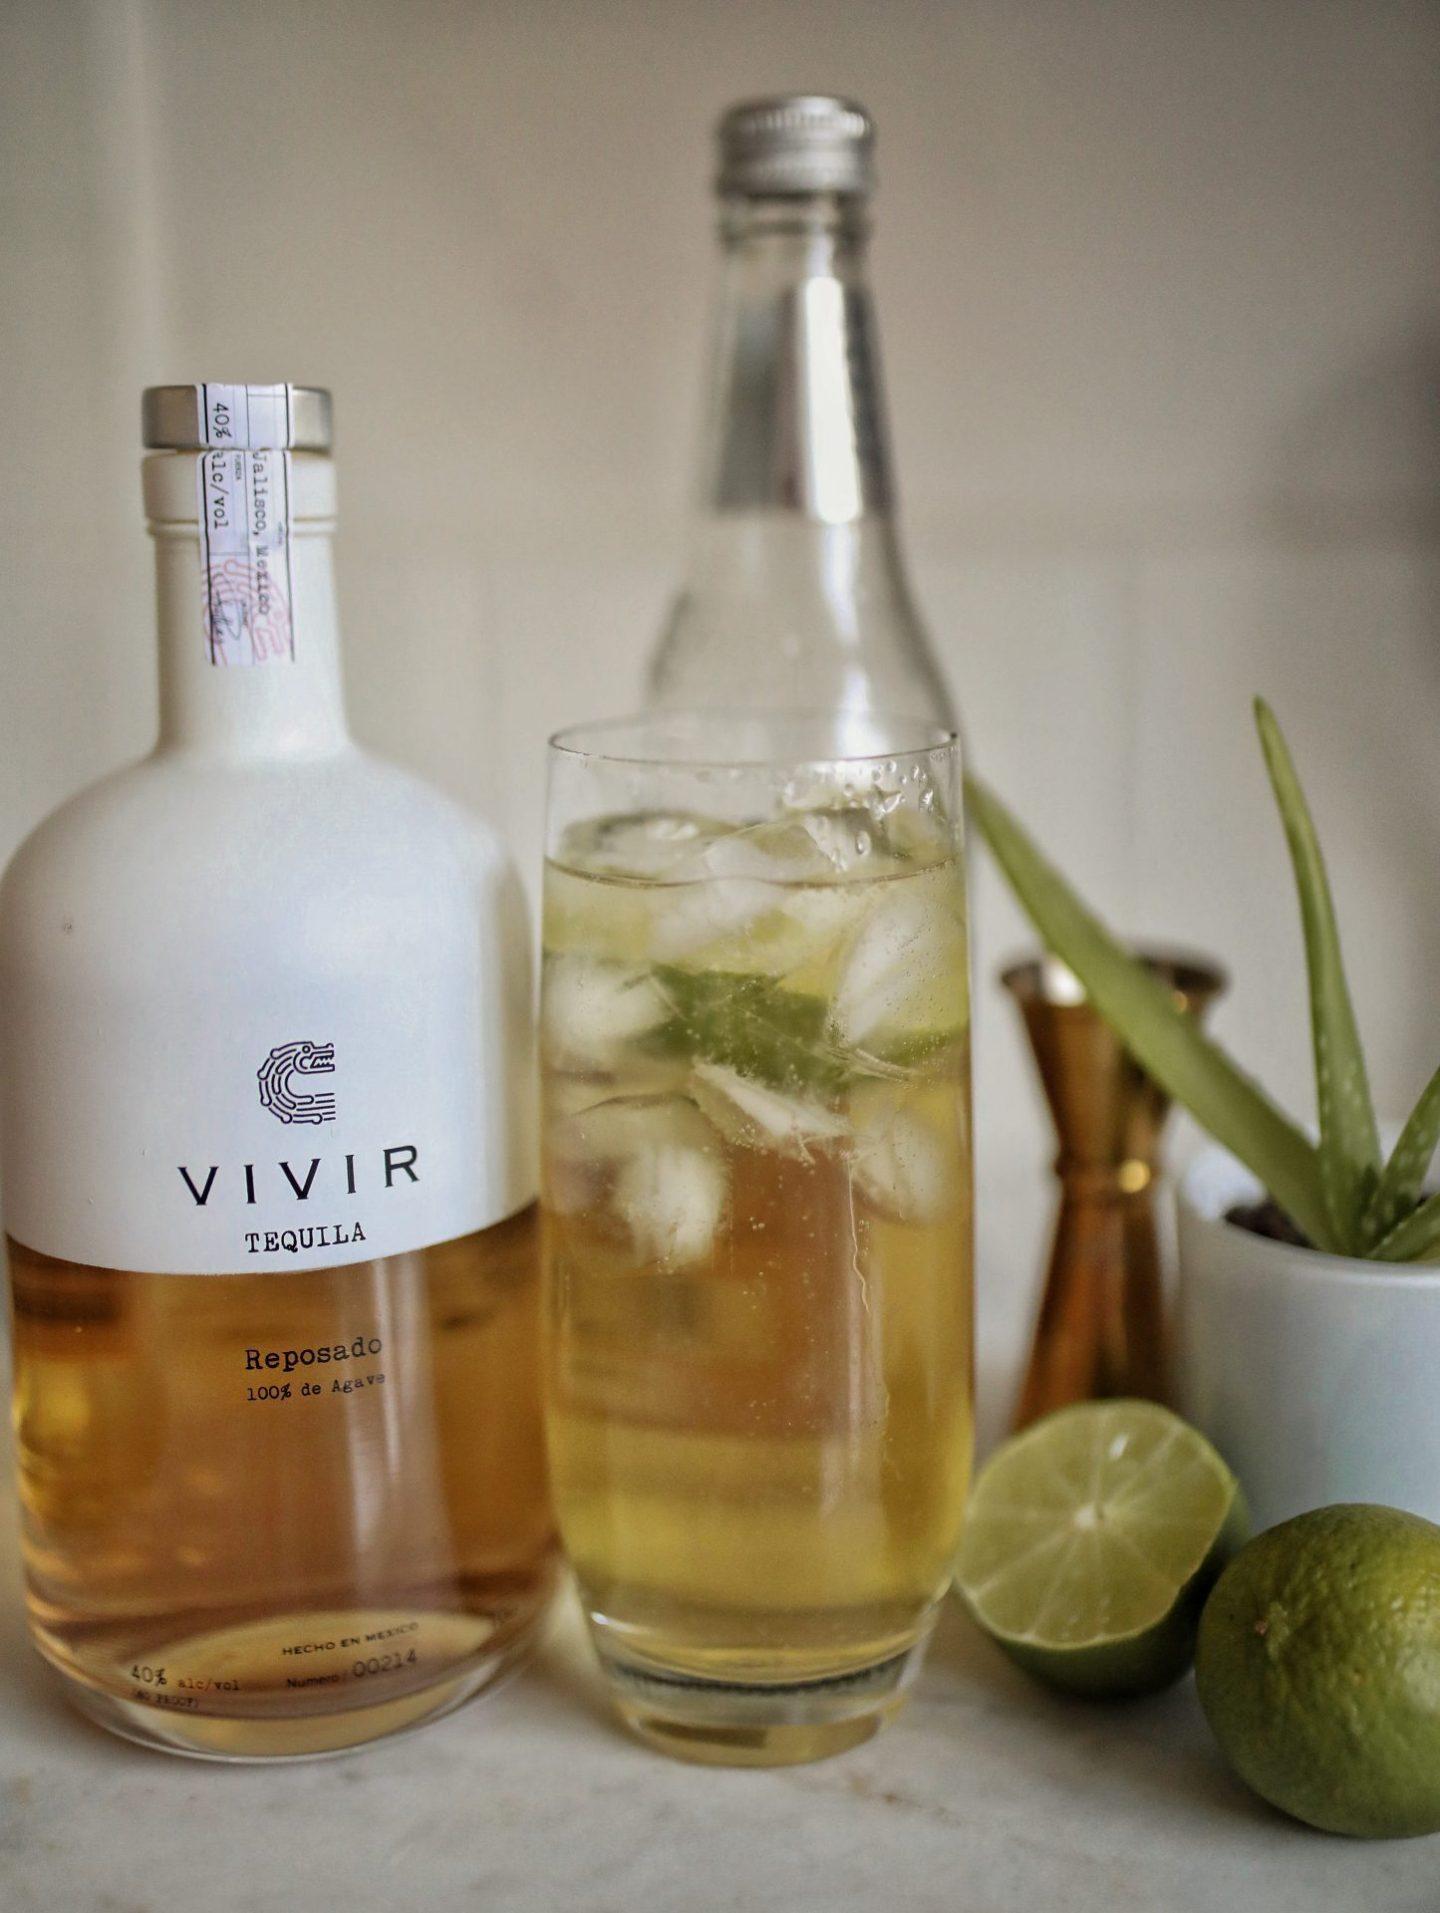 VIVIR Reposado Tequila Ginger Ale